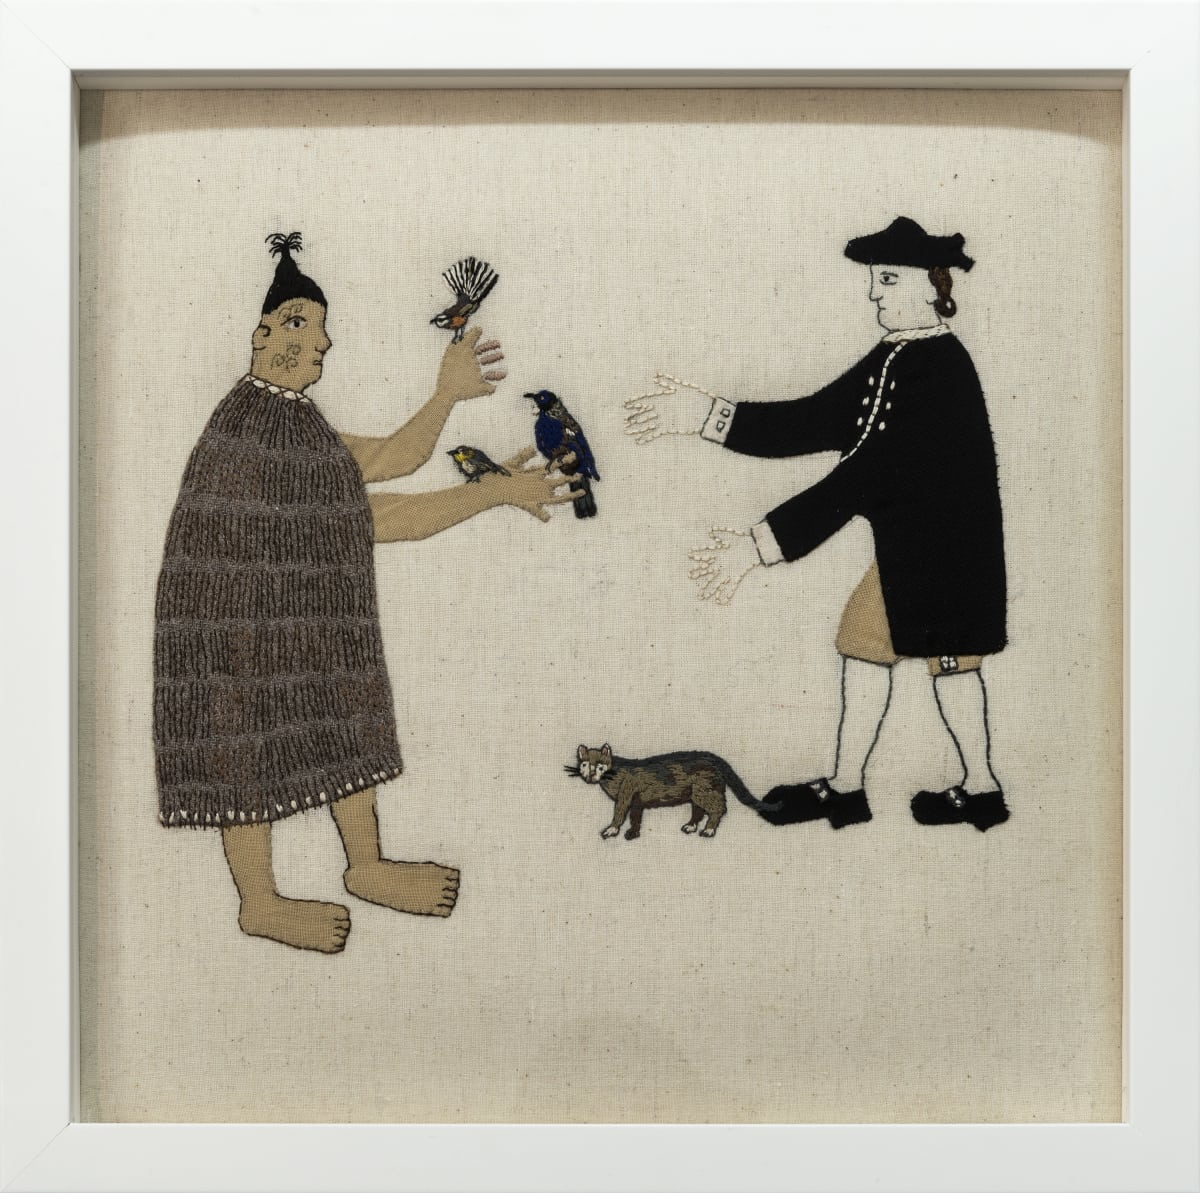 Sarah Munro Trade Item: Cat, Tui, Kereru, Piwakawaka, 2017 Cross-stitch 11.8 x 11.8 in 30 x 30 cm